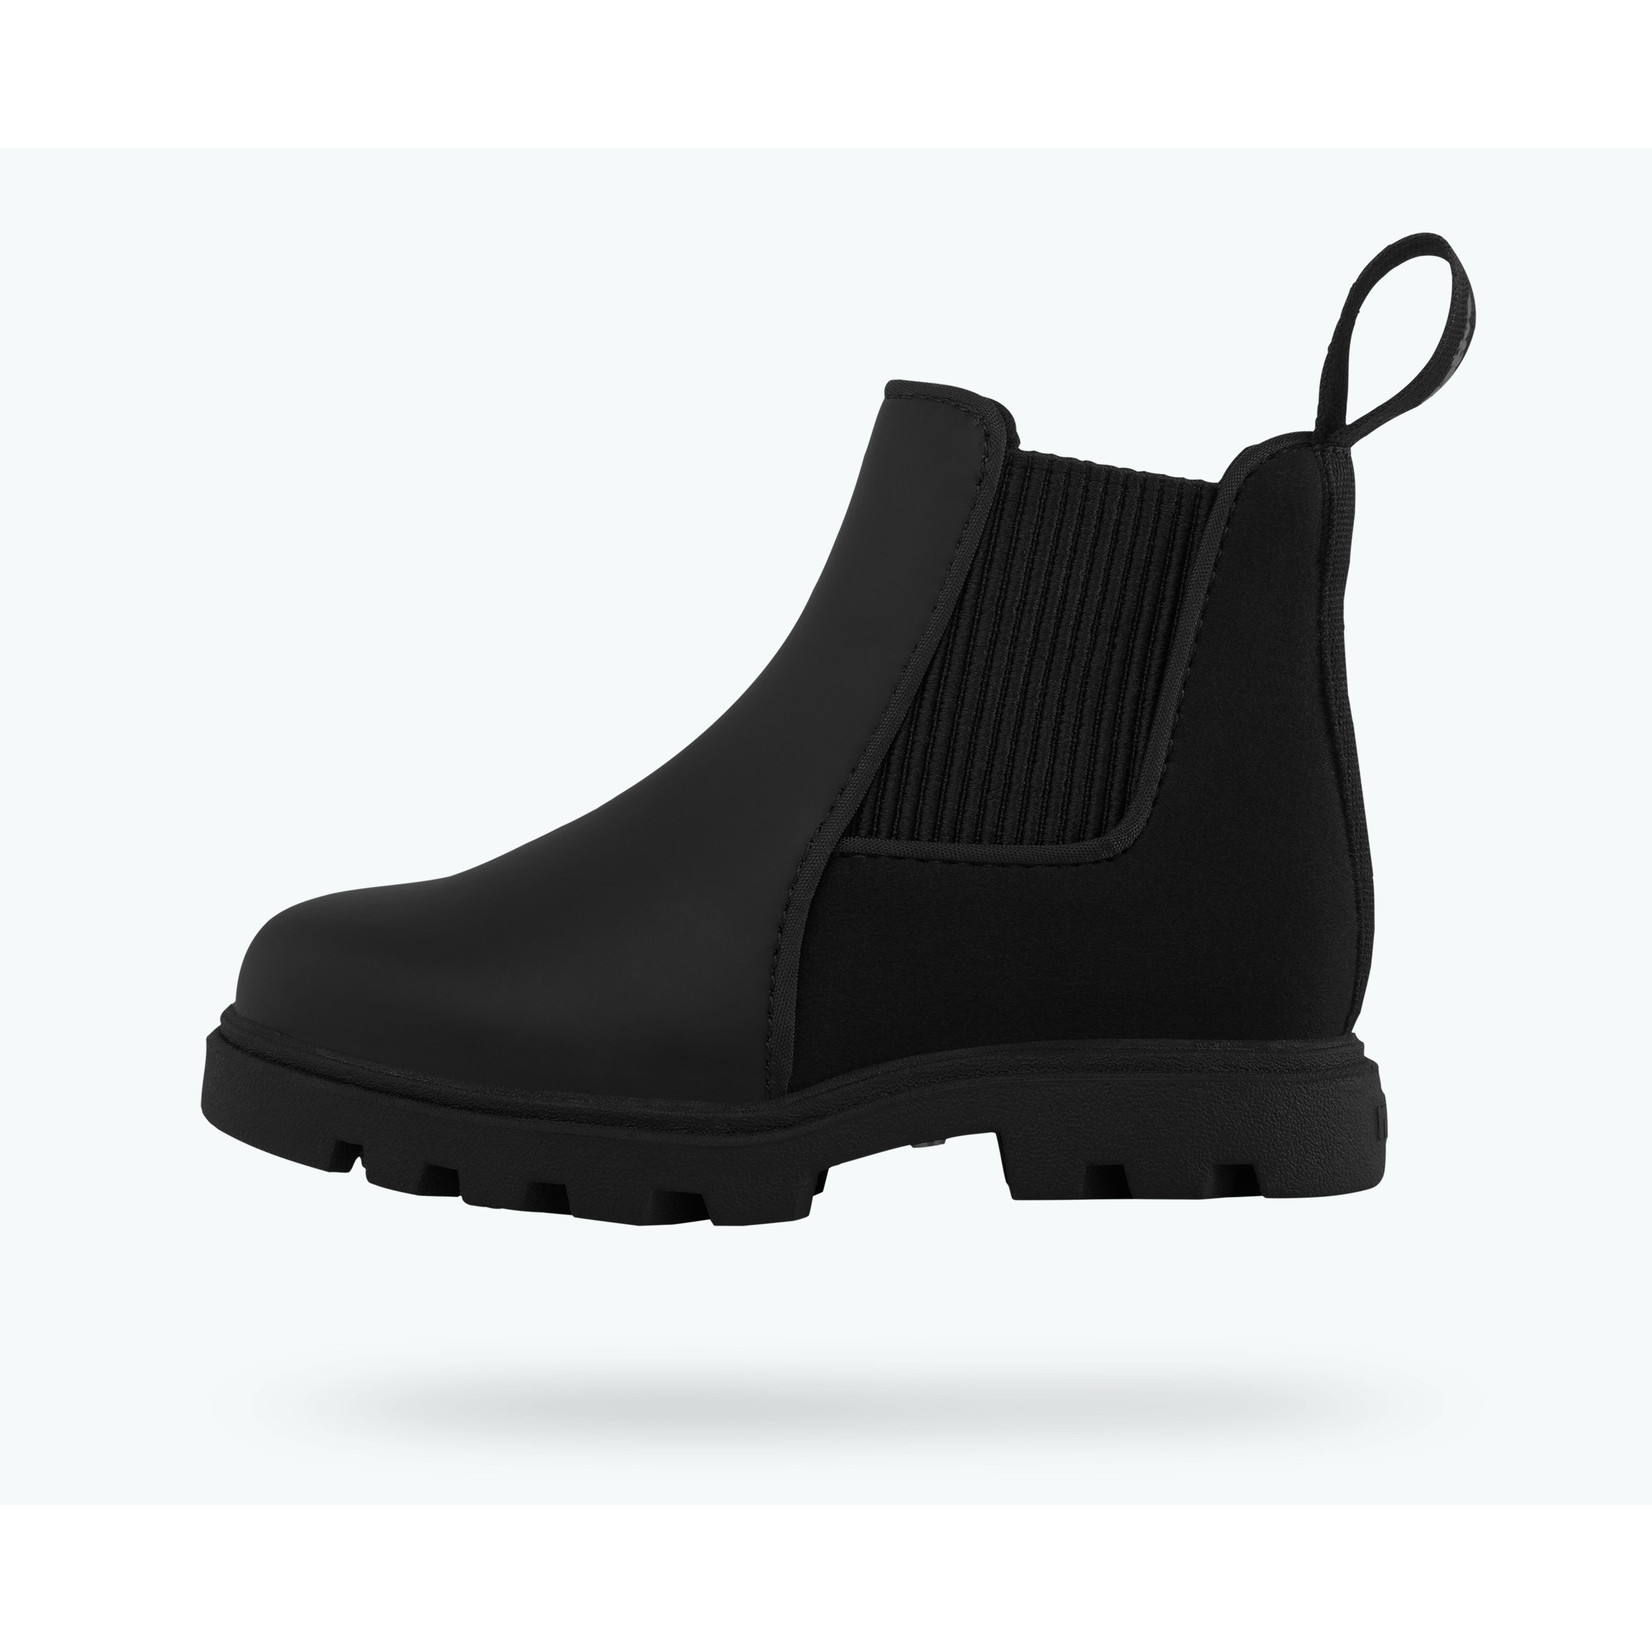 Native Shoes Kensington Treklite -Jiffy Black